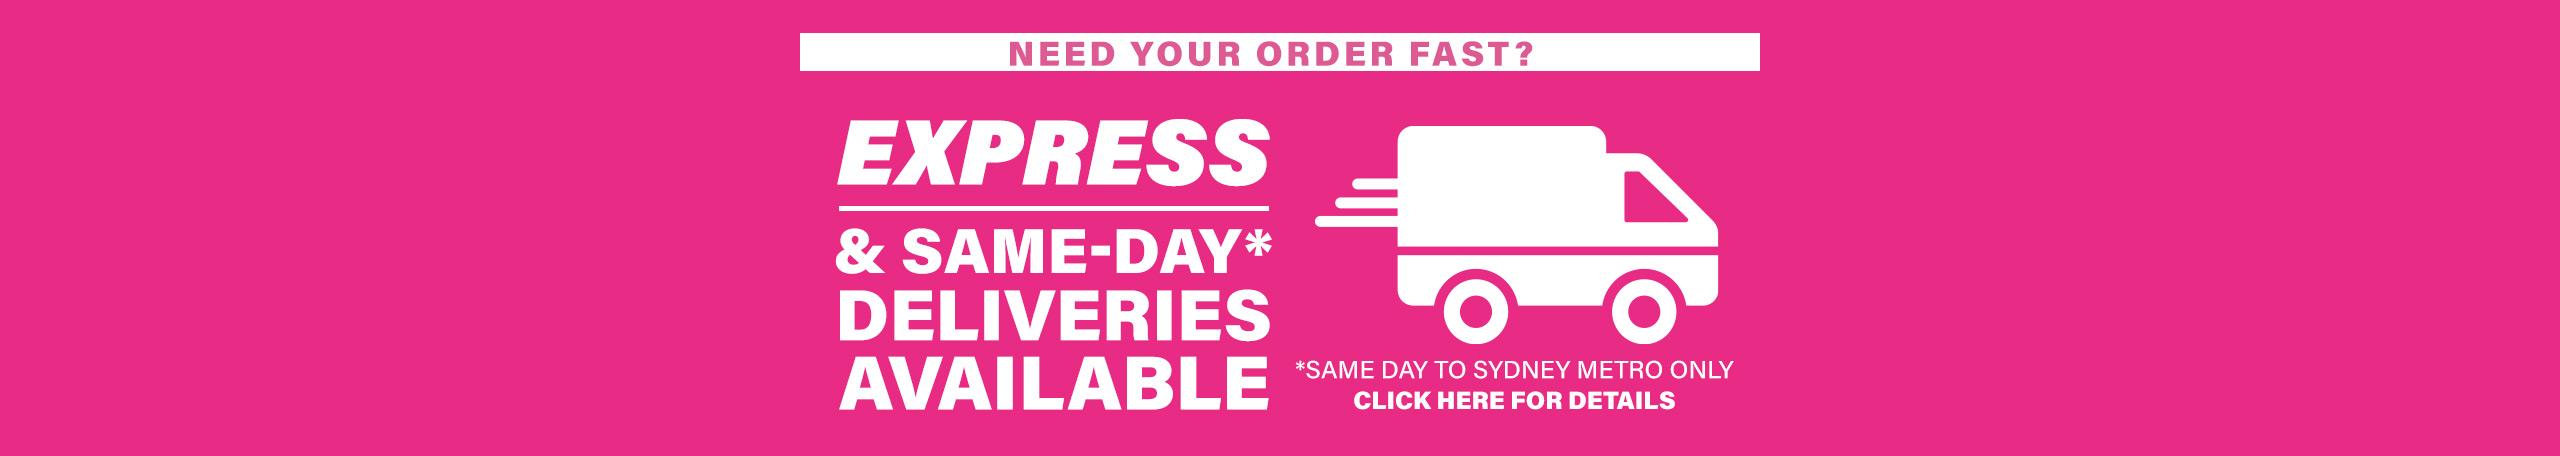 Express Deliveries